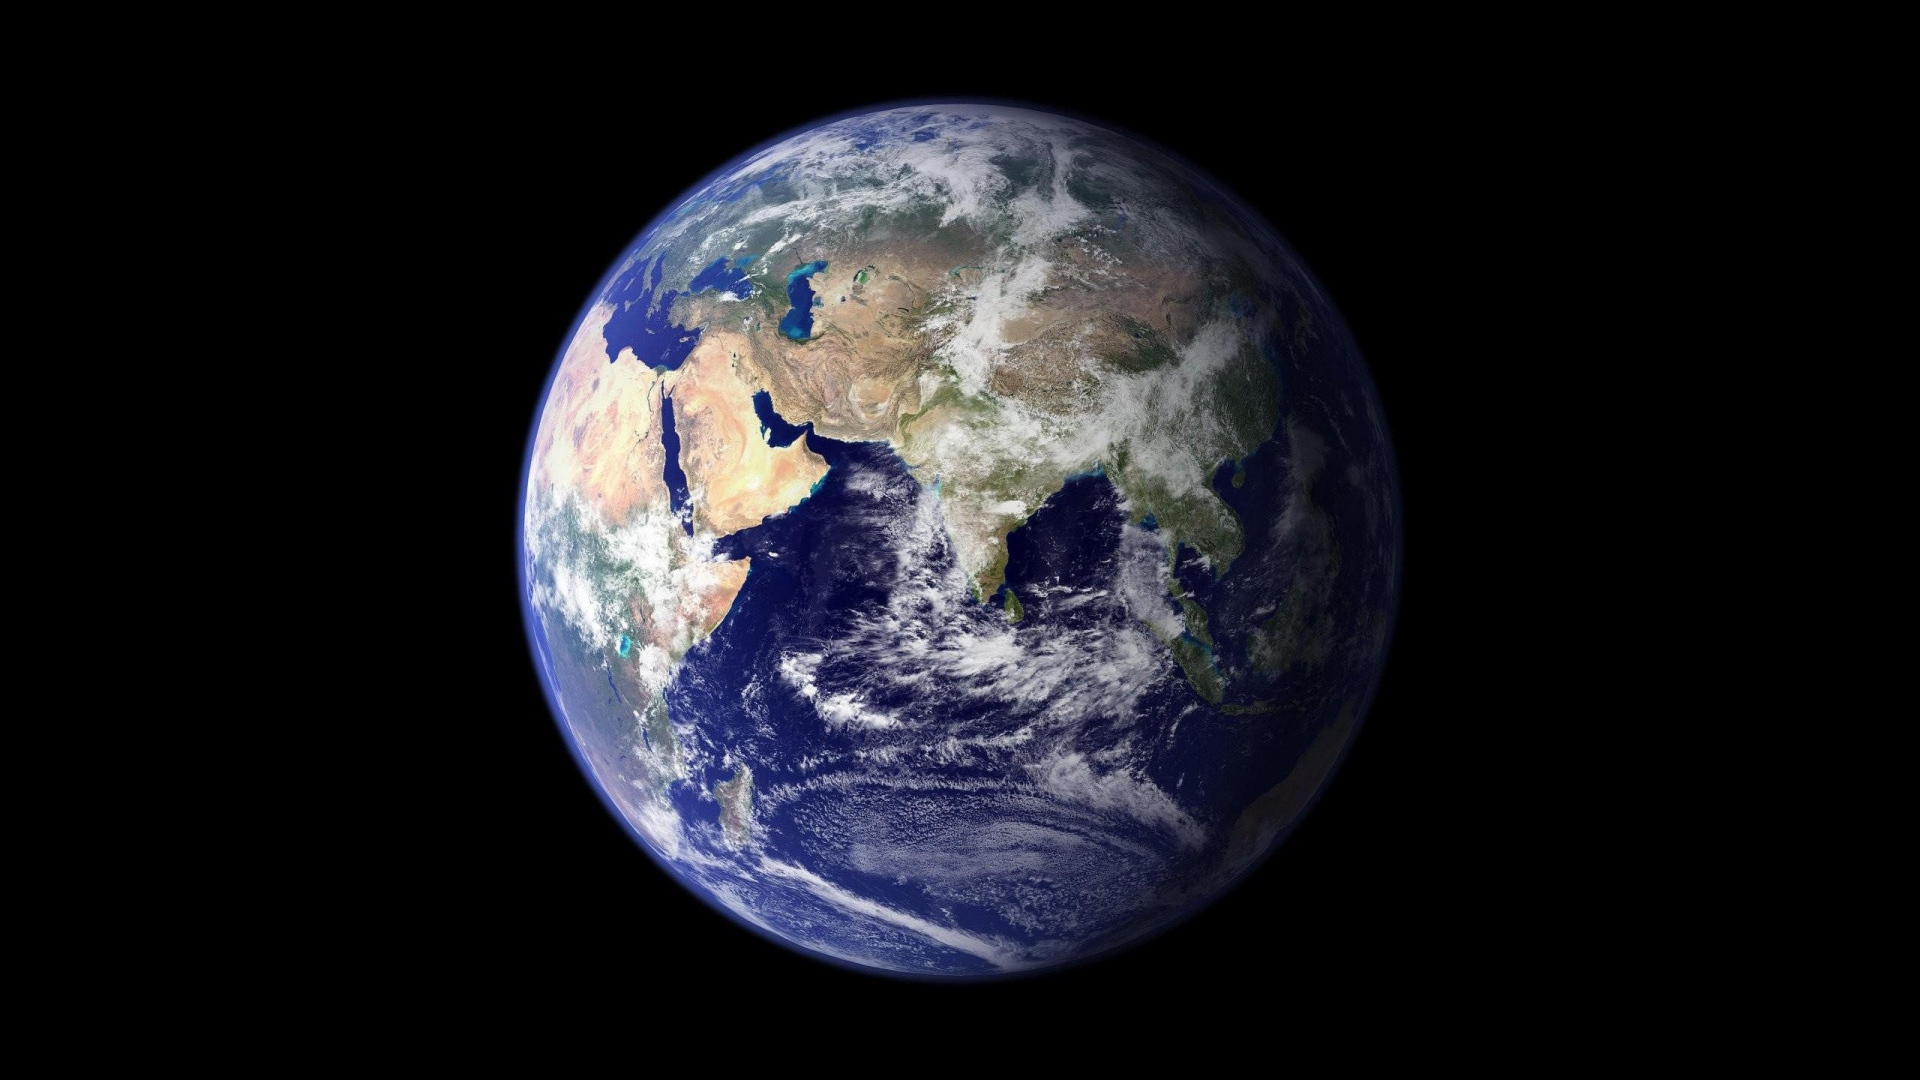 Planet Erde Hd